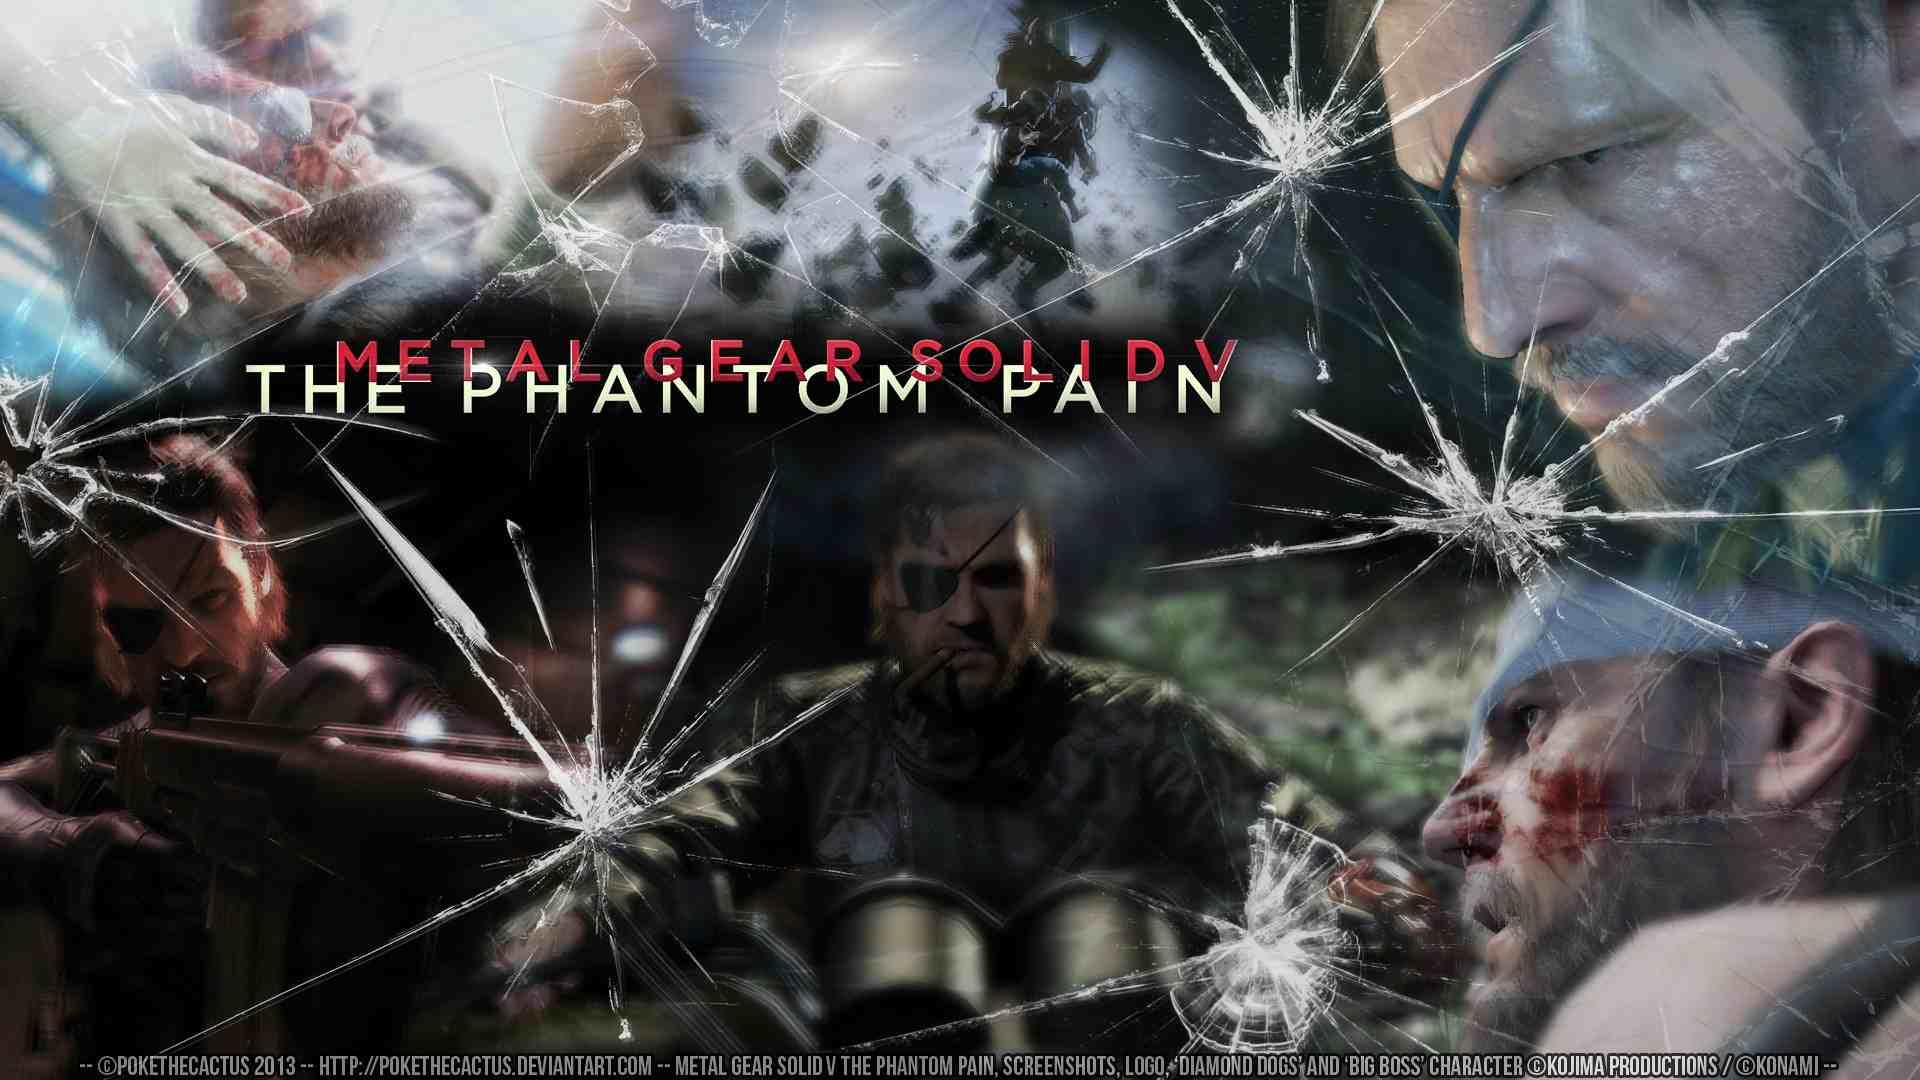 TGS '13: Metal Gear Solid V TGS demo